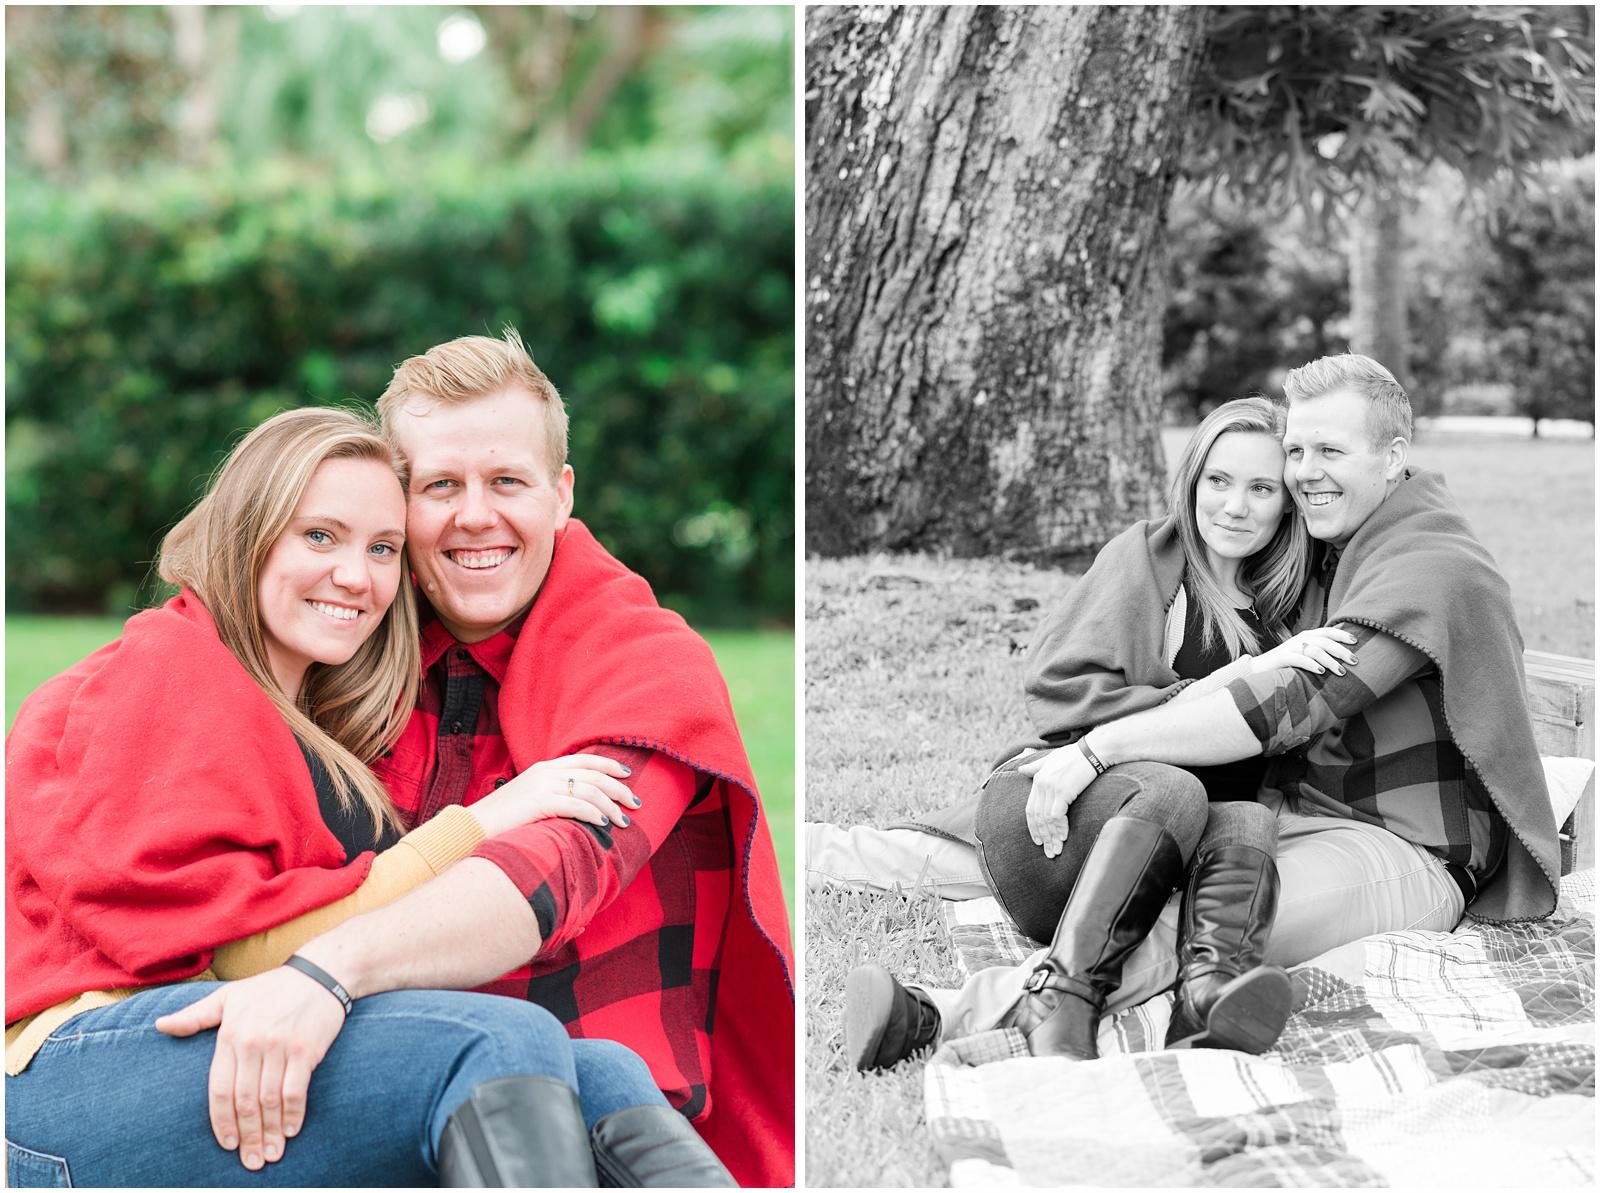 Palm Coast_Washington Oaks Garden_State Park_Engagement_Portraits_23.jpg